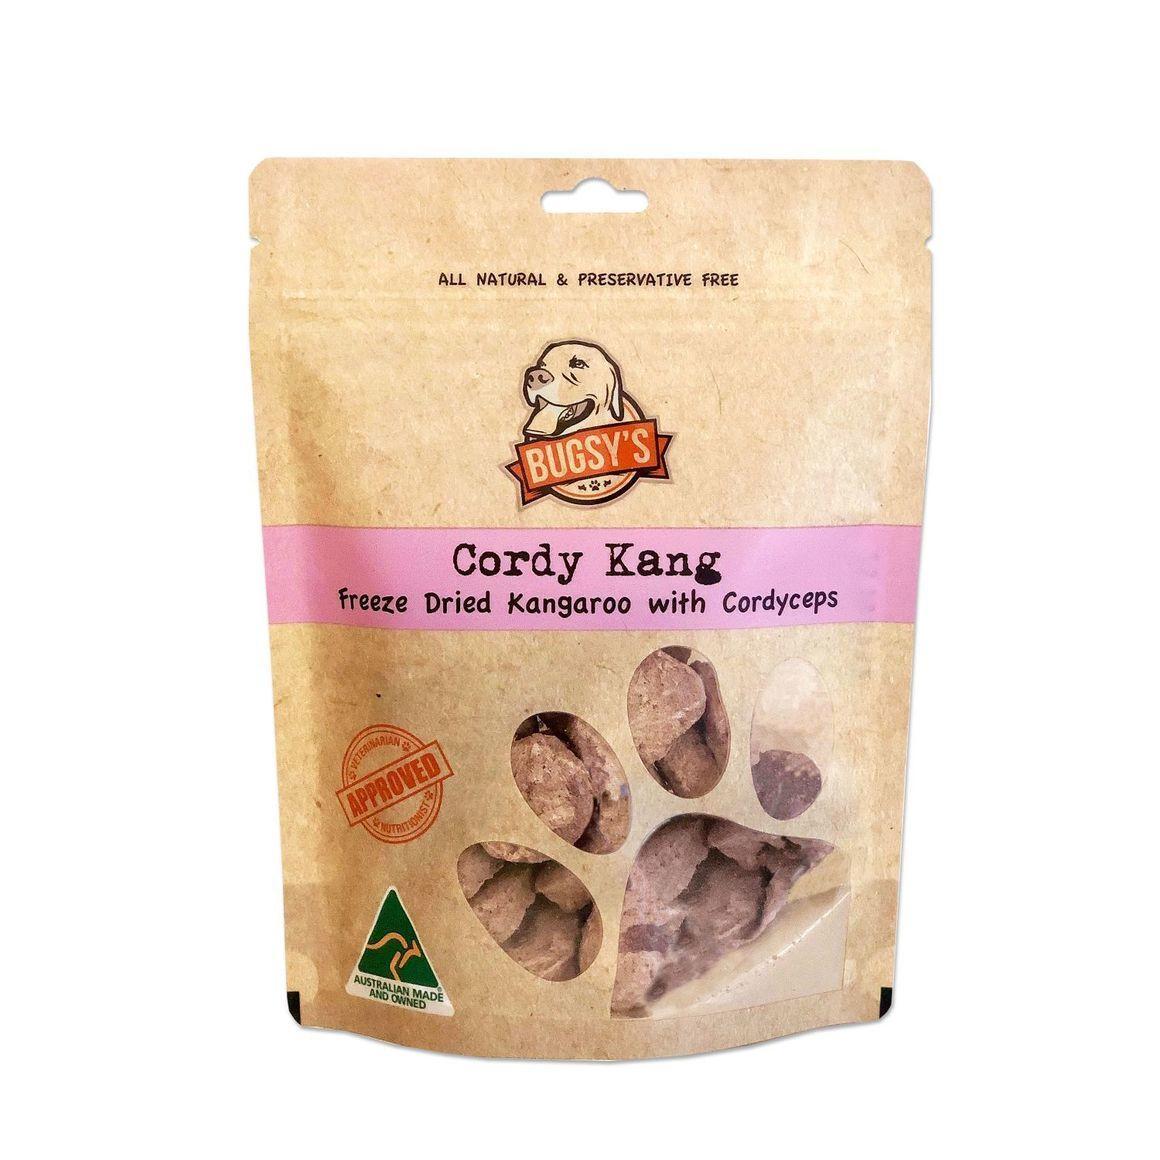 Cordy Kang | Freeze Dried Australian Kangaroo with Cordyceps | Trada Marketplace